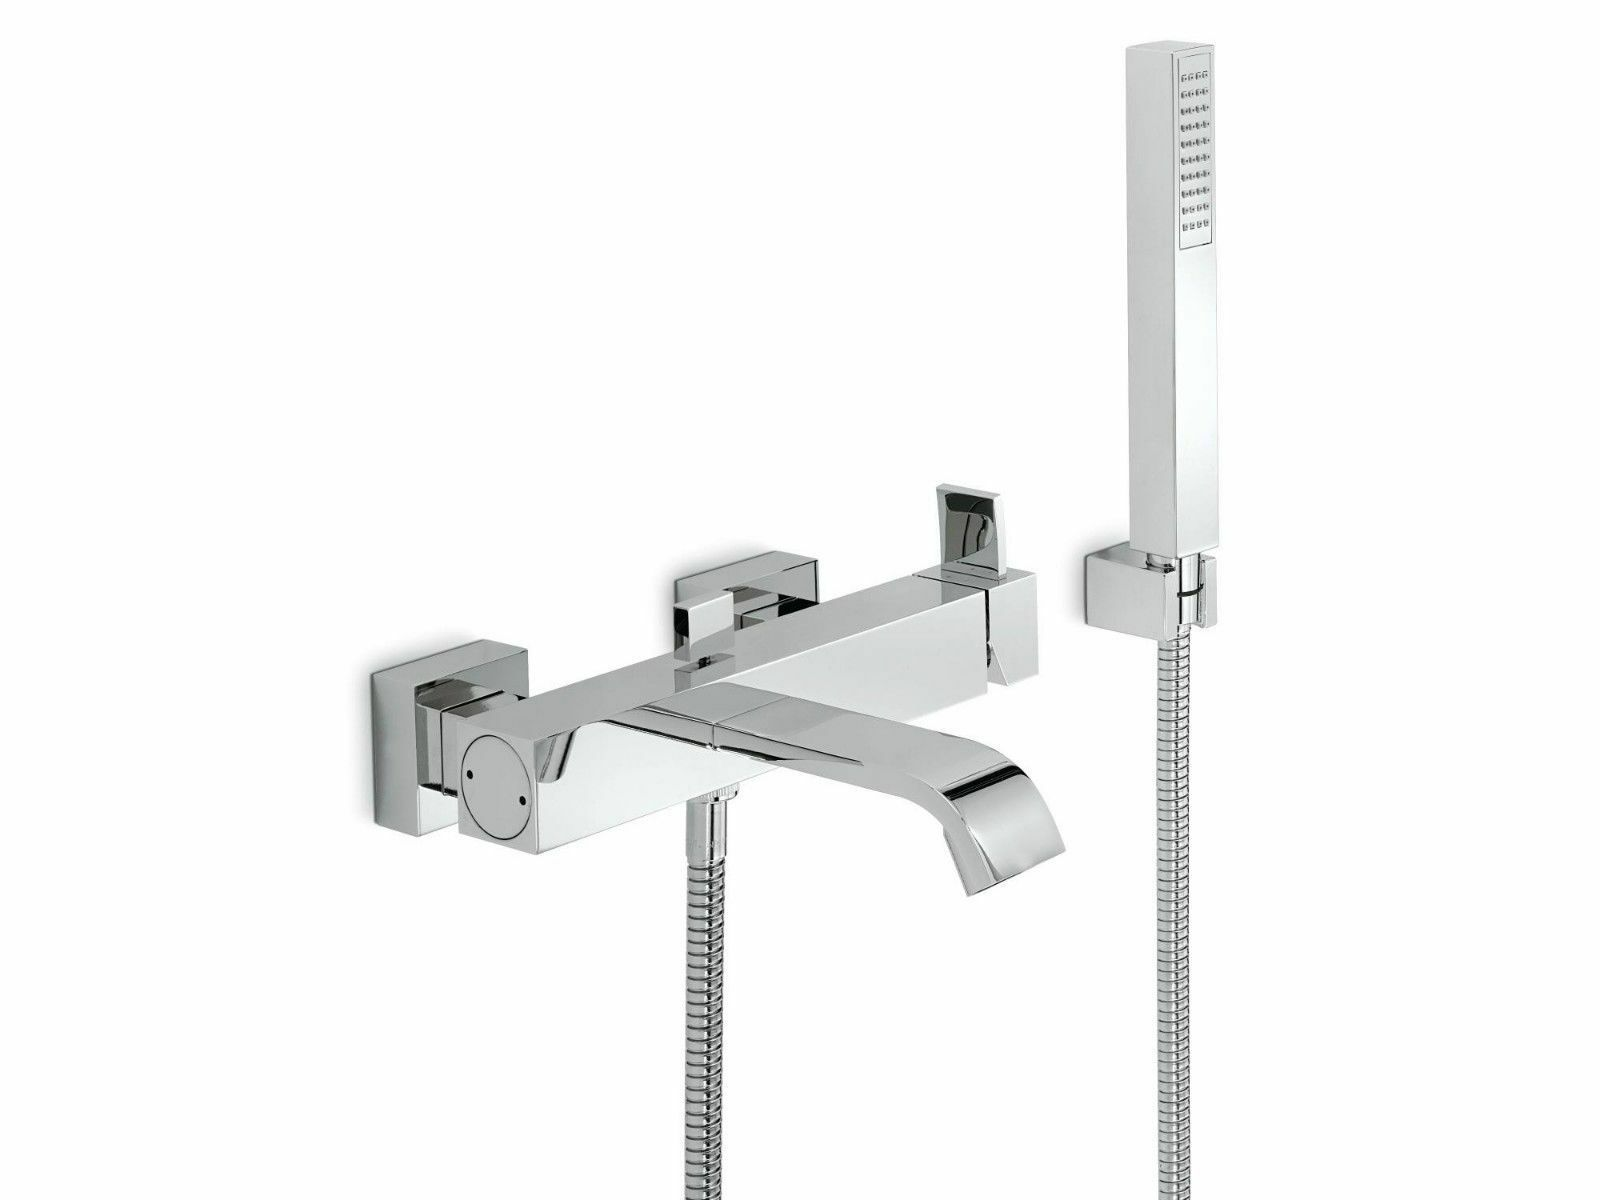 OFFERTA GRUPPO VASCA NEWFORM D-SIGN MIX 62040C.21.018 WANNENARMATUR BATHTUB TAPS